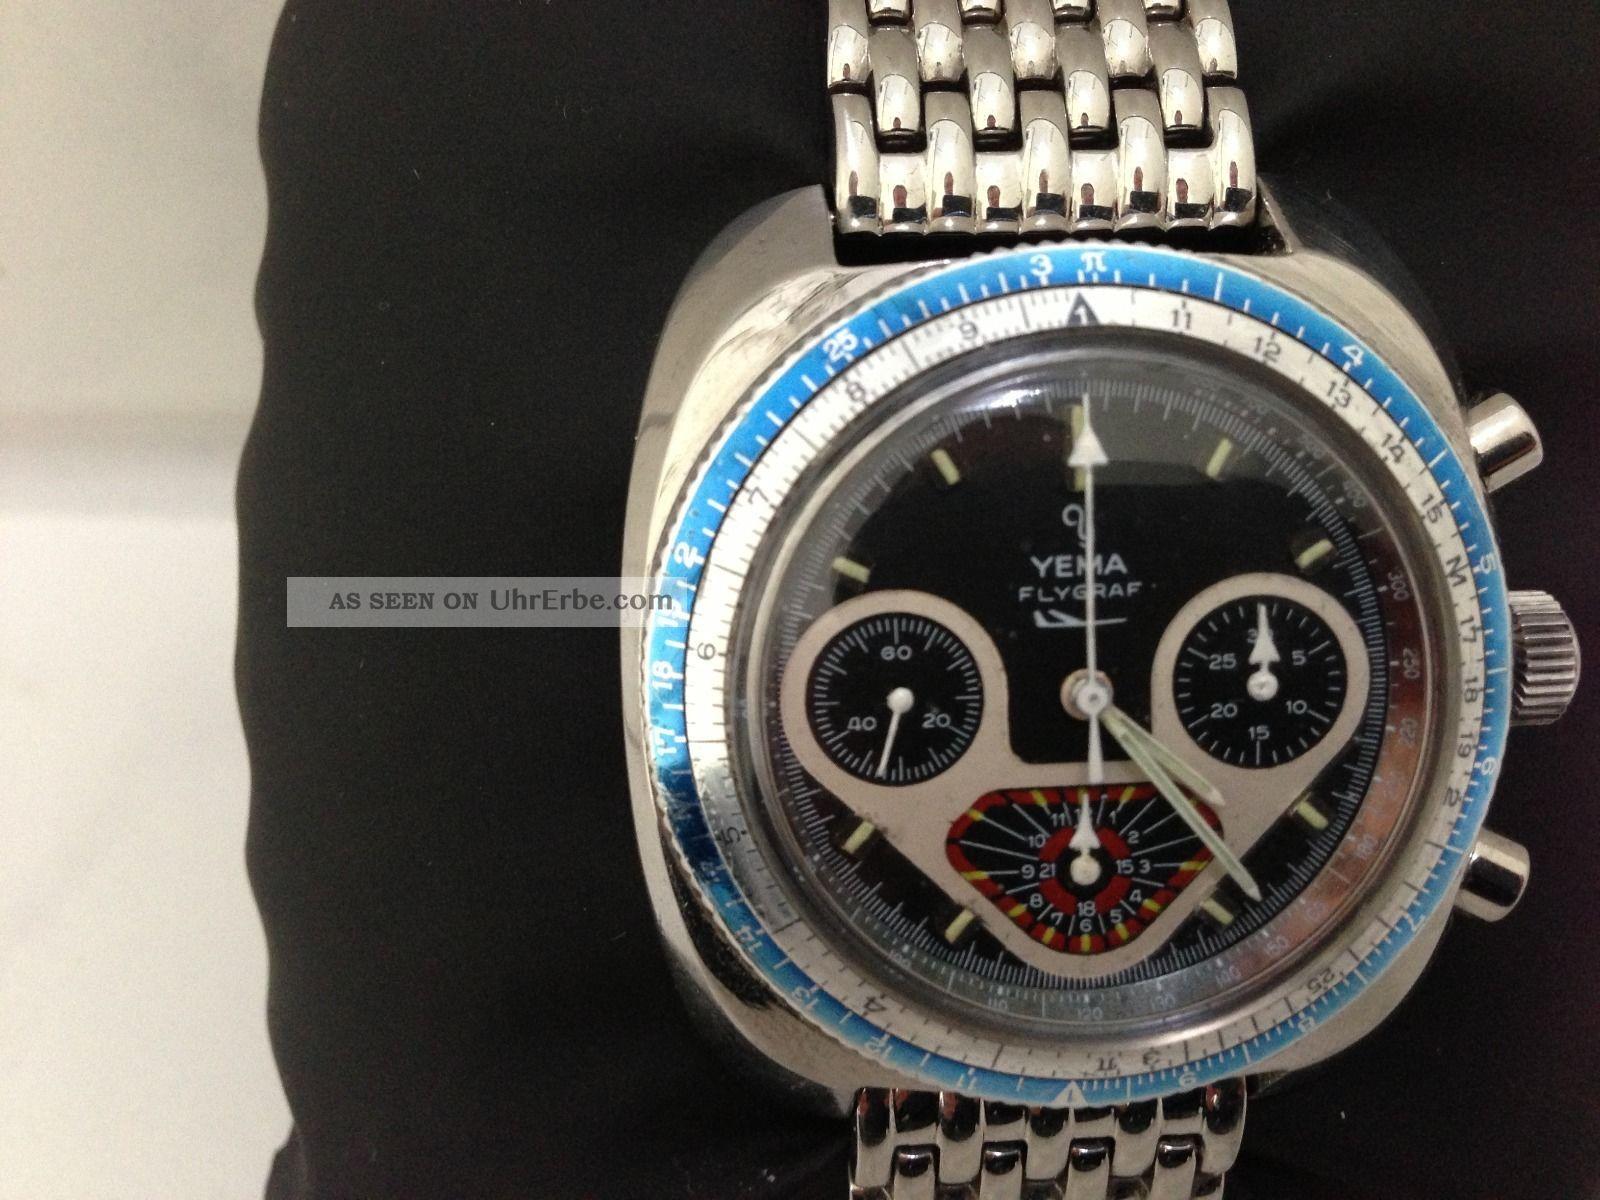 Sammler Uhr Yema Flygraf Armbanduhren Bild